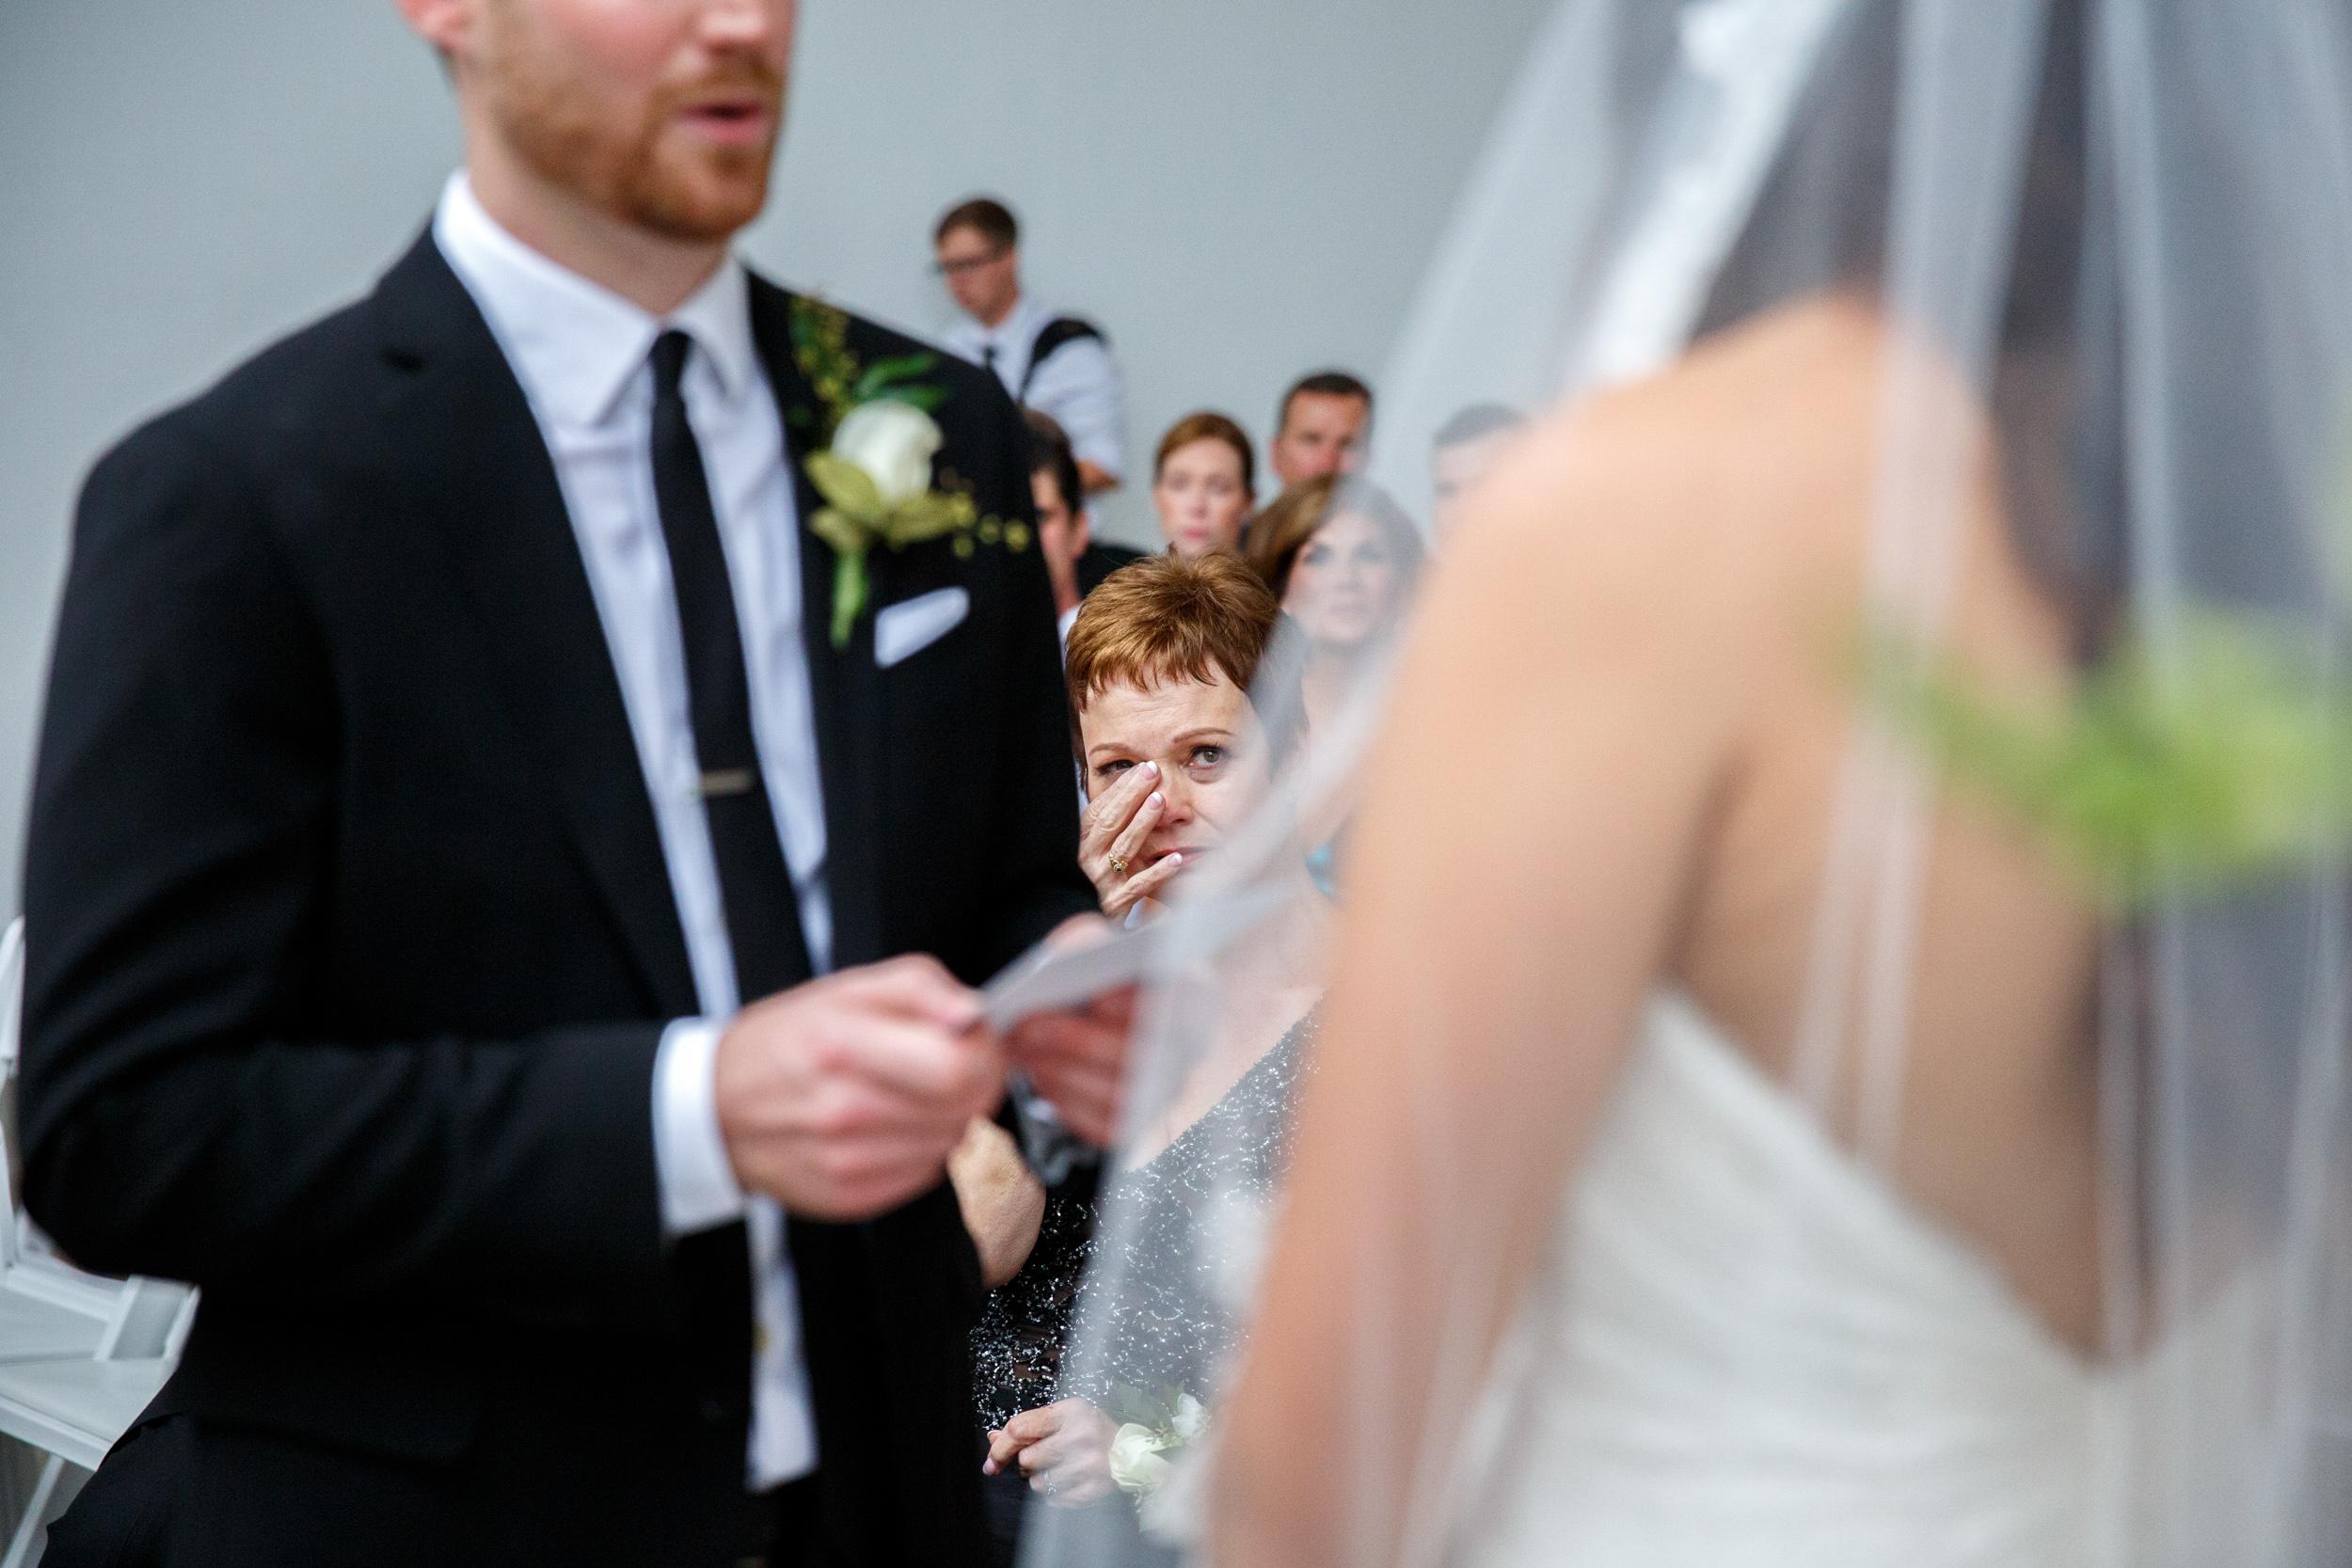 9-09-2016 Flora & Colin wedding photography by Brian Milo-151.jpg